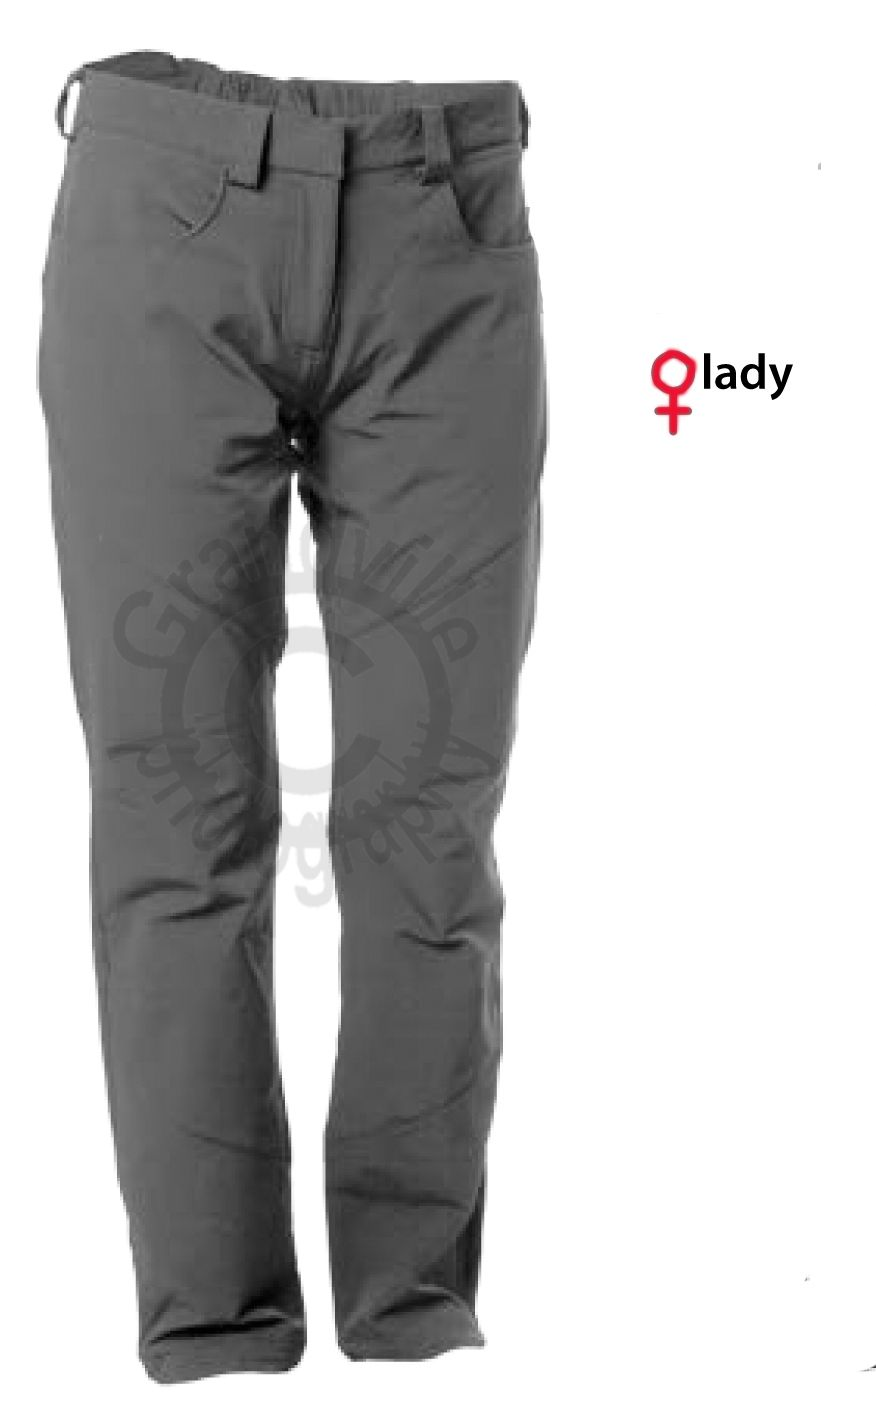 Outdoorix - Warmpeace Flea lady frost grey / frost grey dámské kalhoty